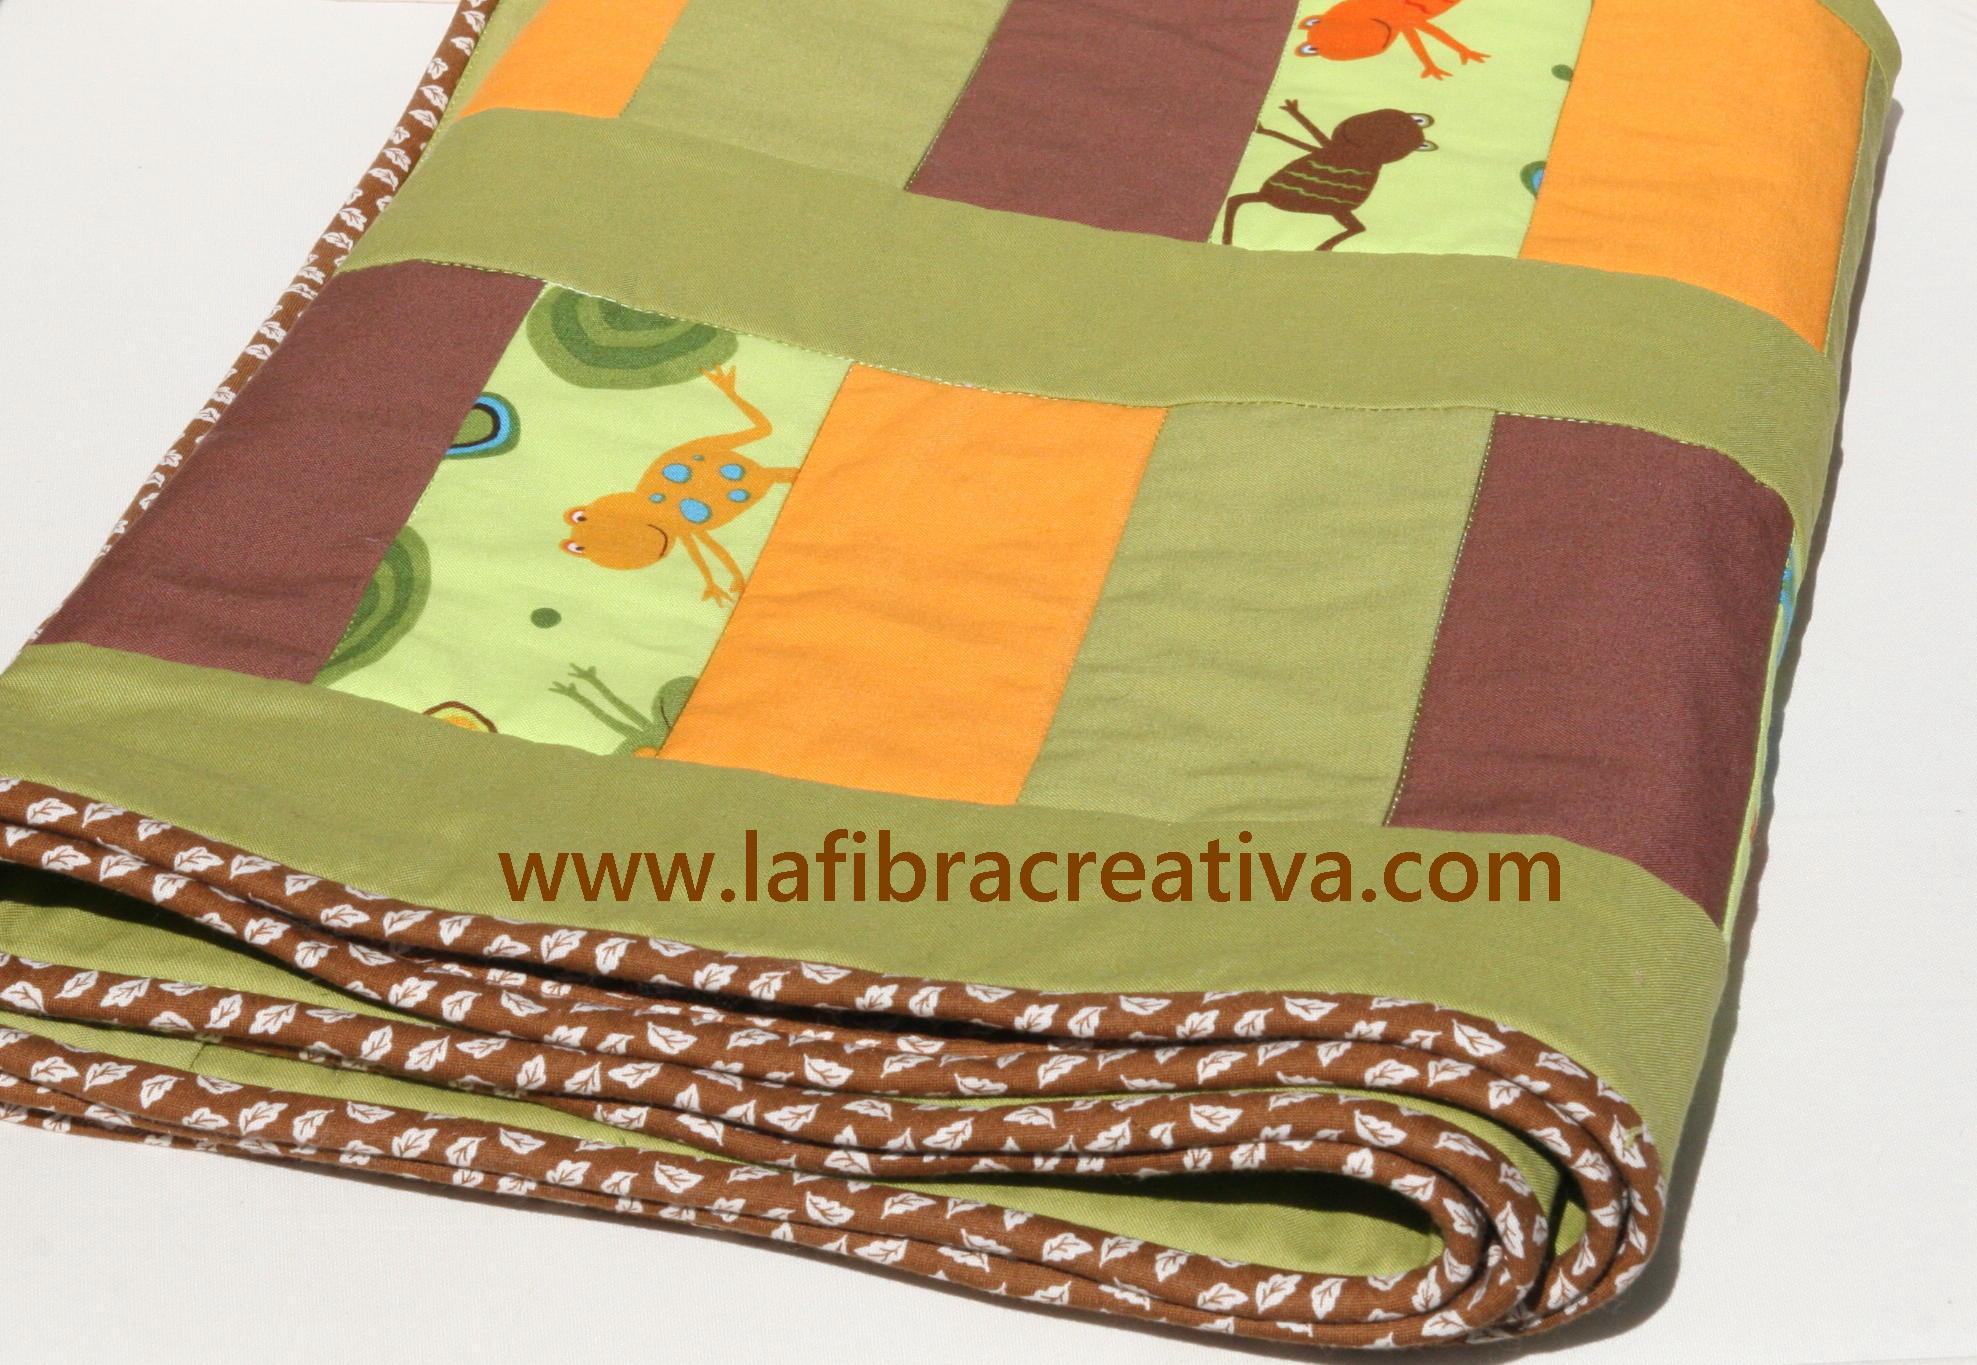 colcha quilt patchwork verde marrón naranja ranas